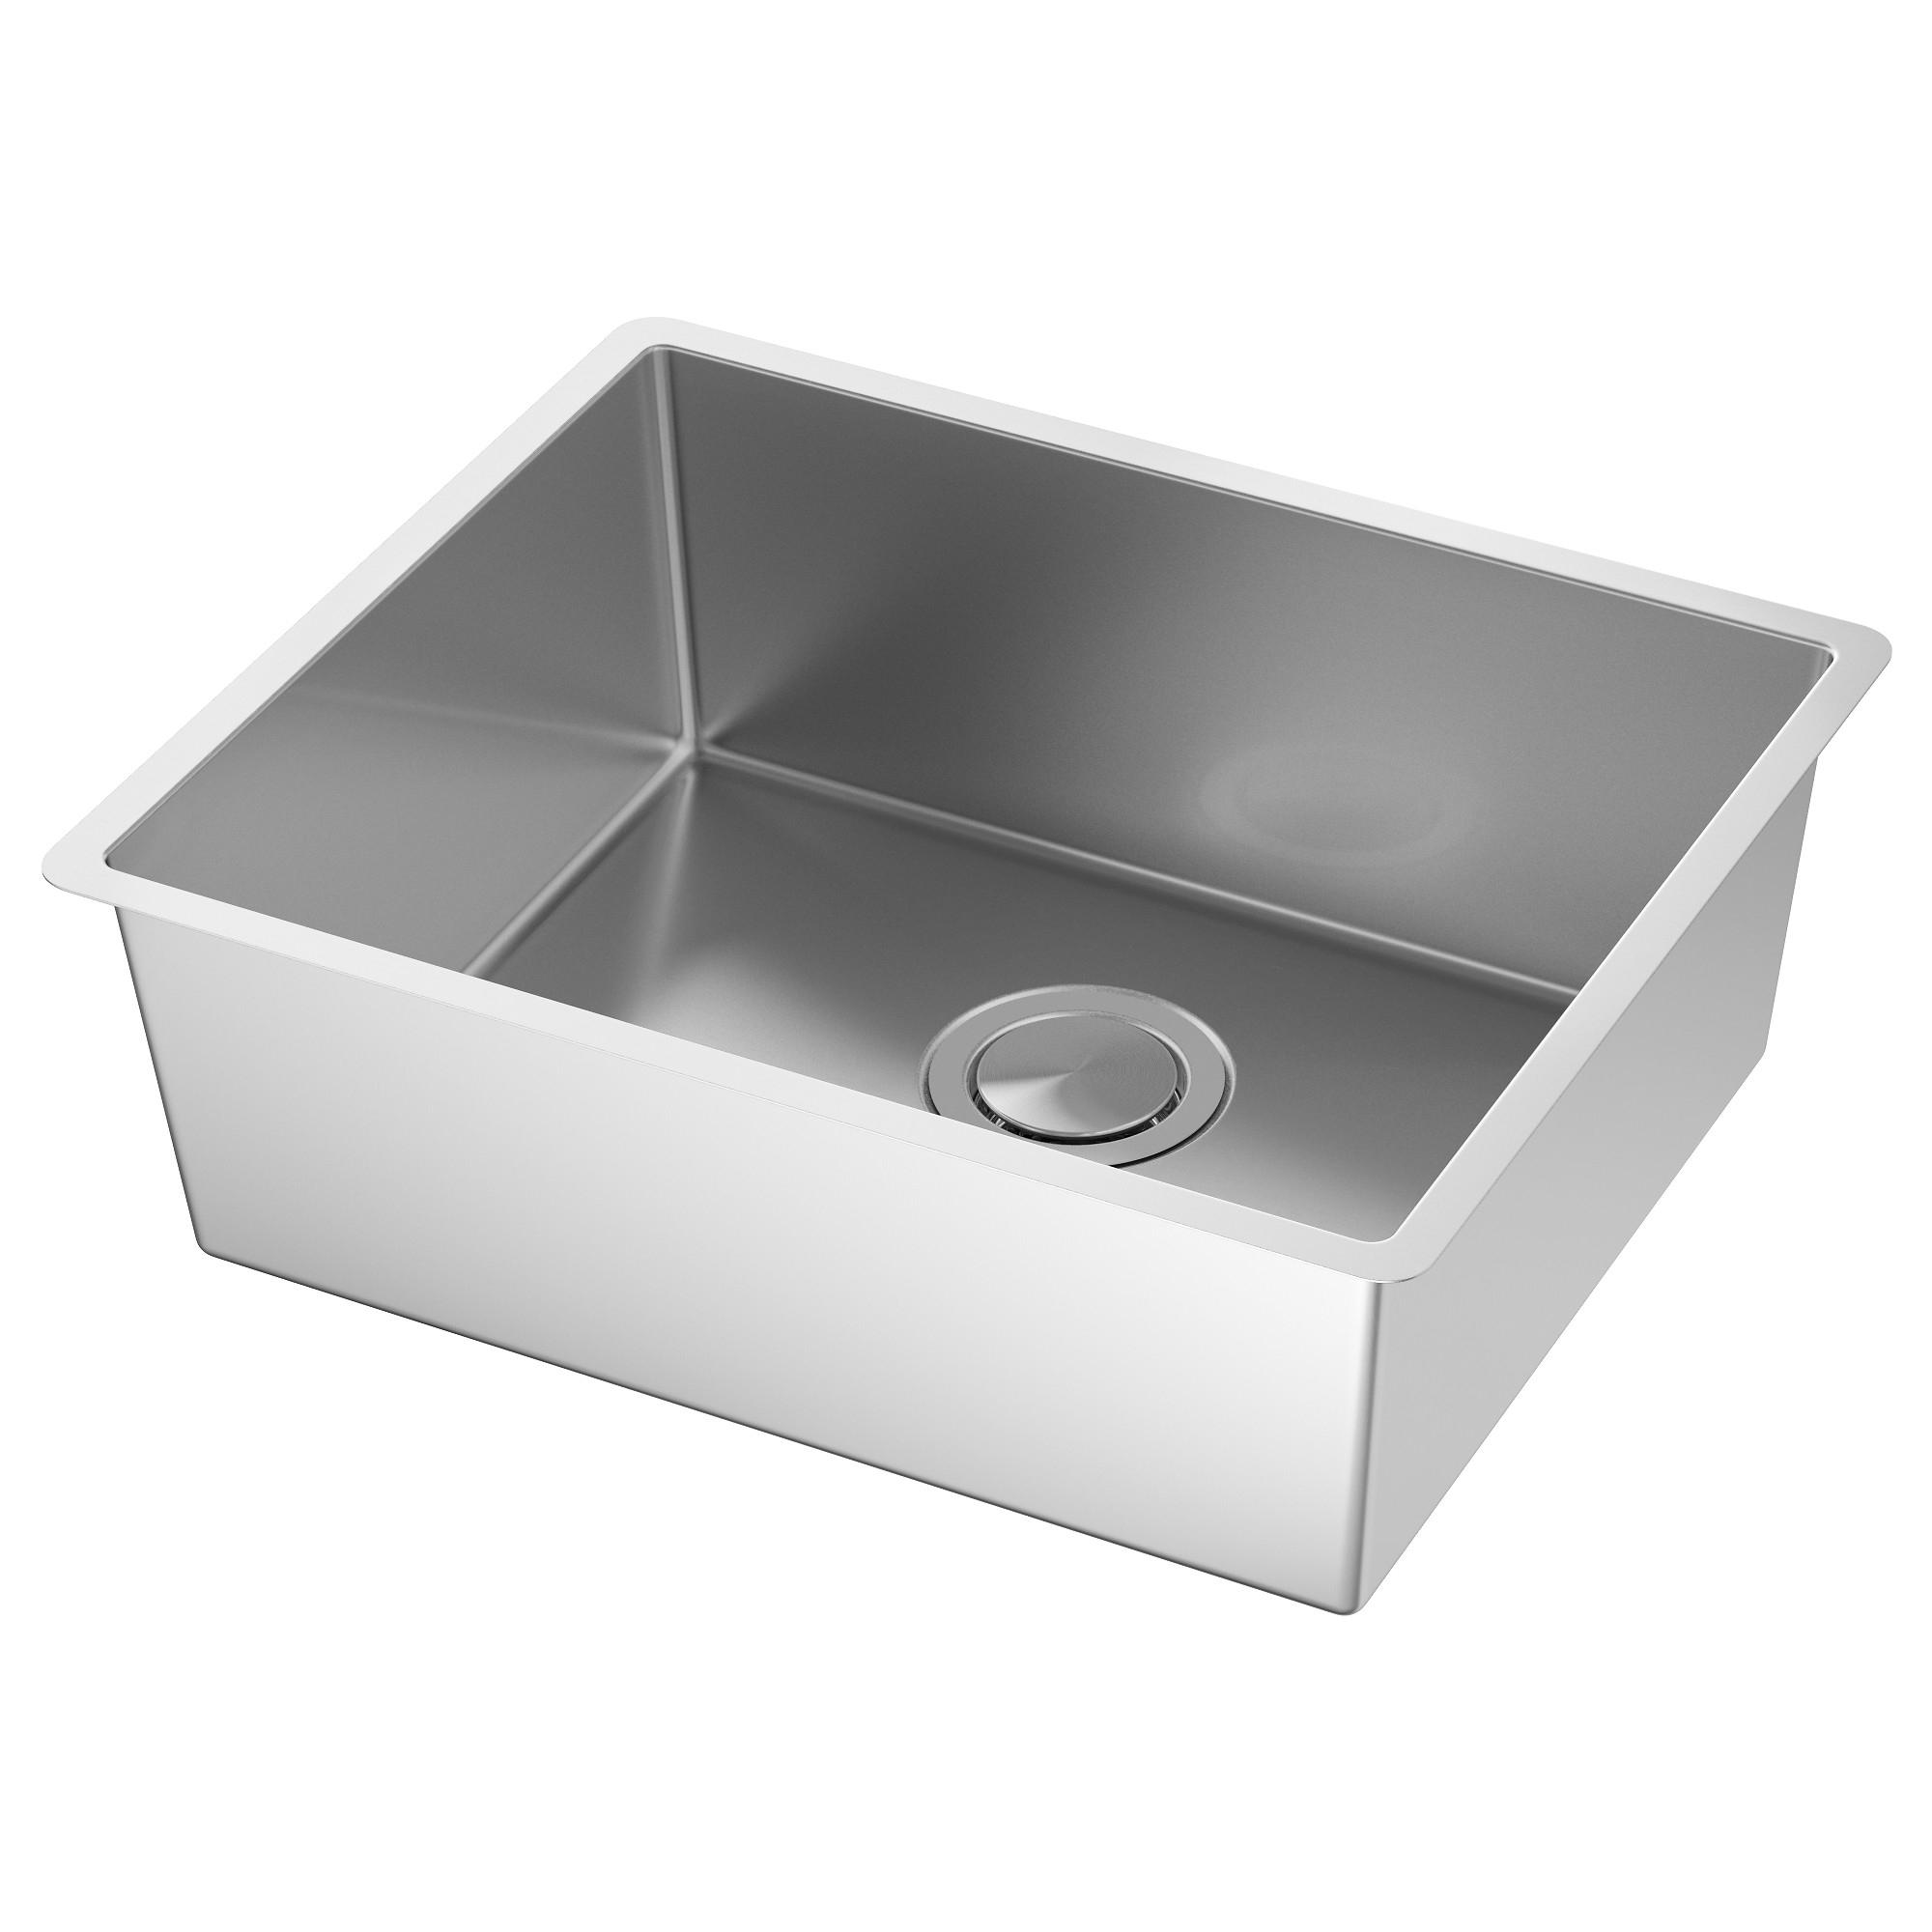 Ikea Kitchen Vs Lowes: Pila Fregadero Para Exterior. Best P Pila Granito